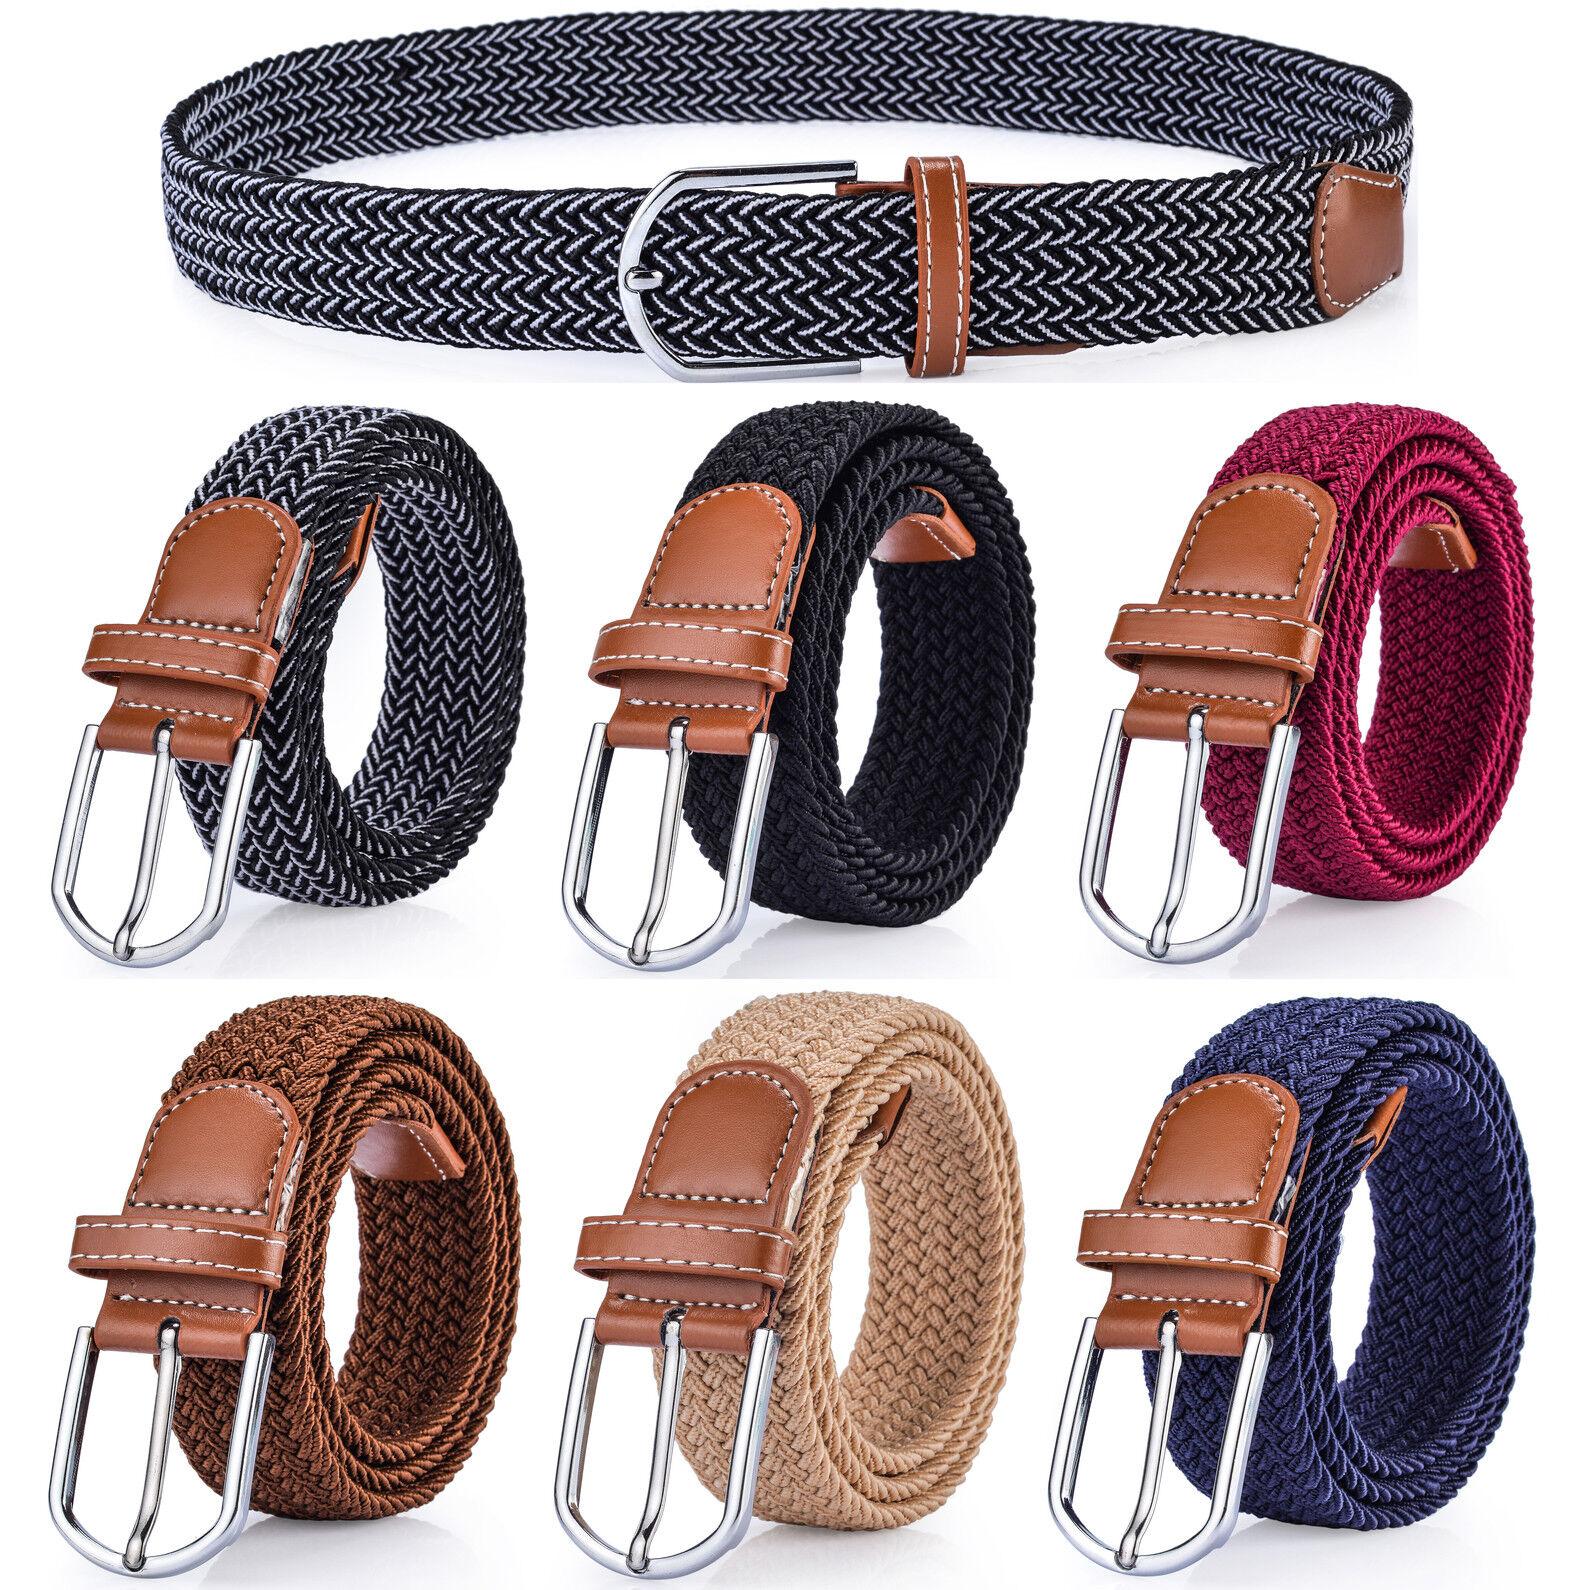 Women's Casual Belt, Braided Polyester Elastic Stretch Belt Belts